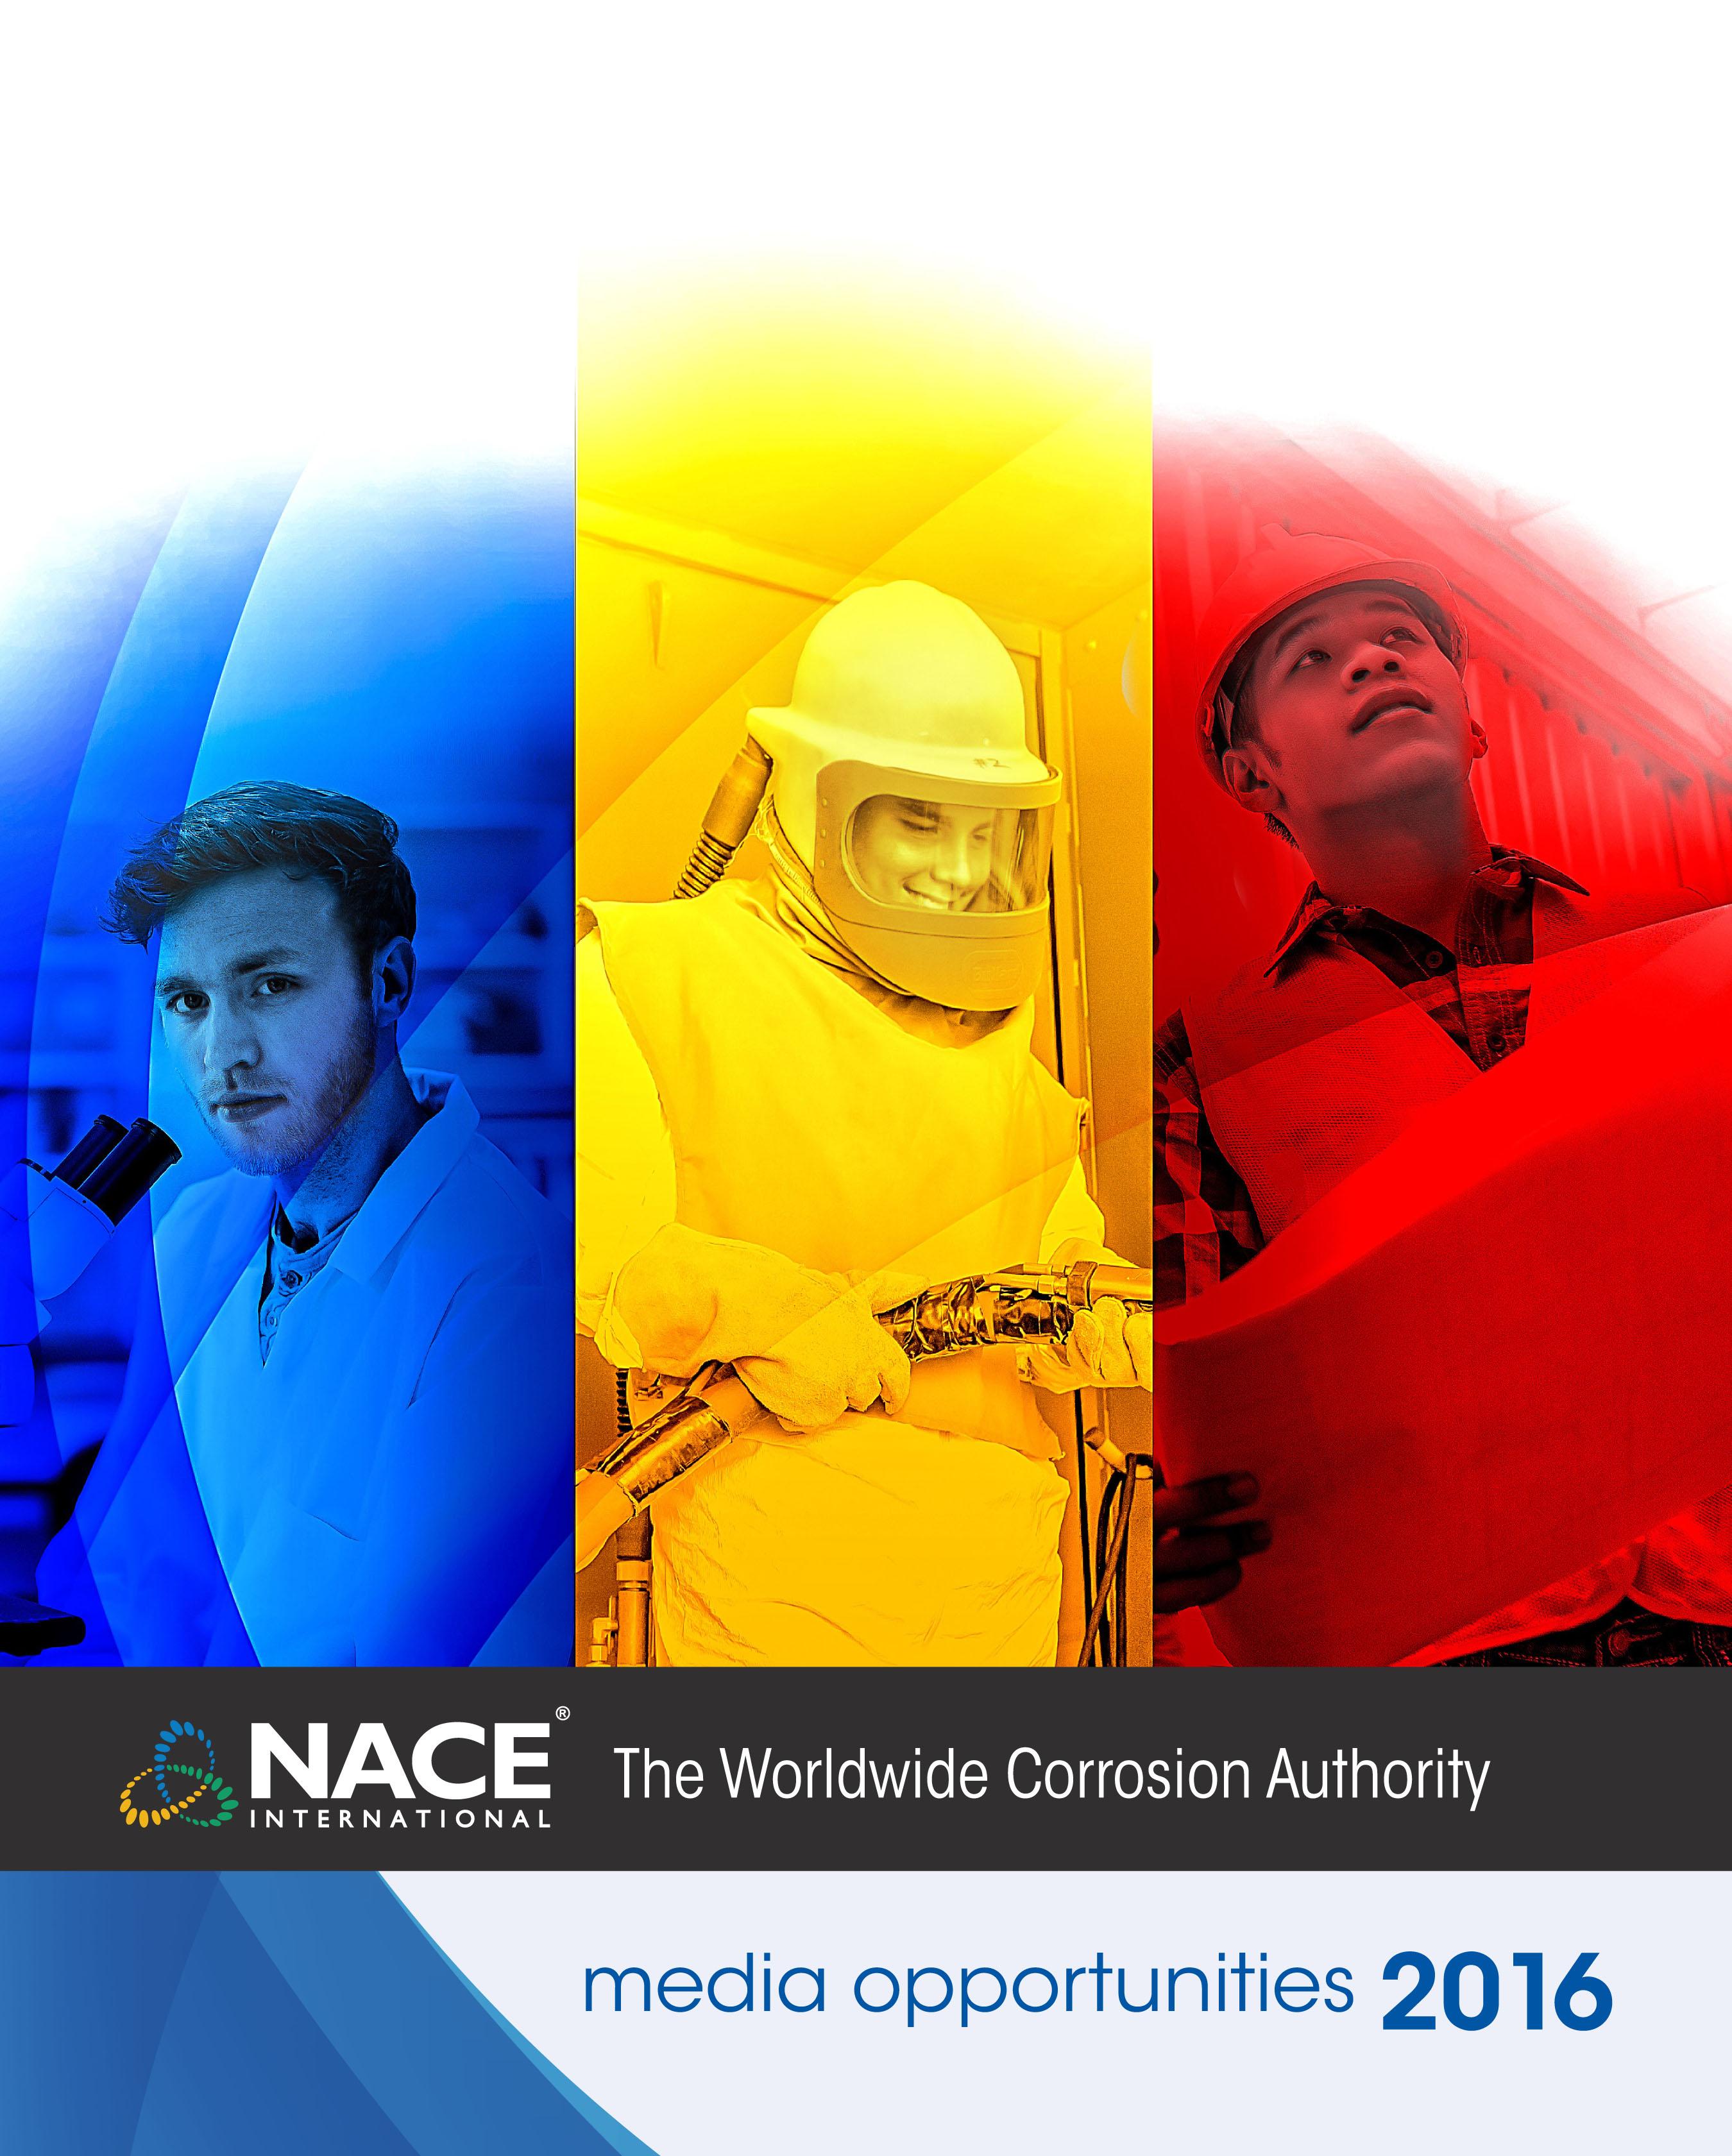 2015 Gold - NACE International